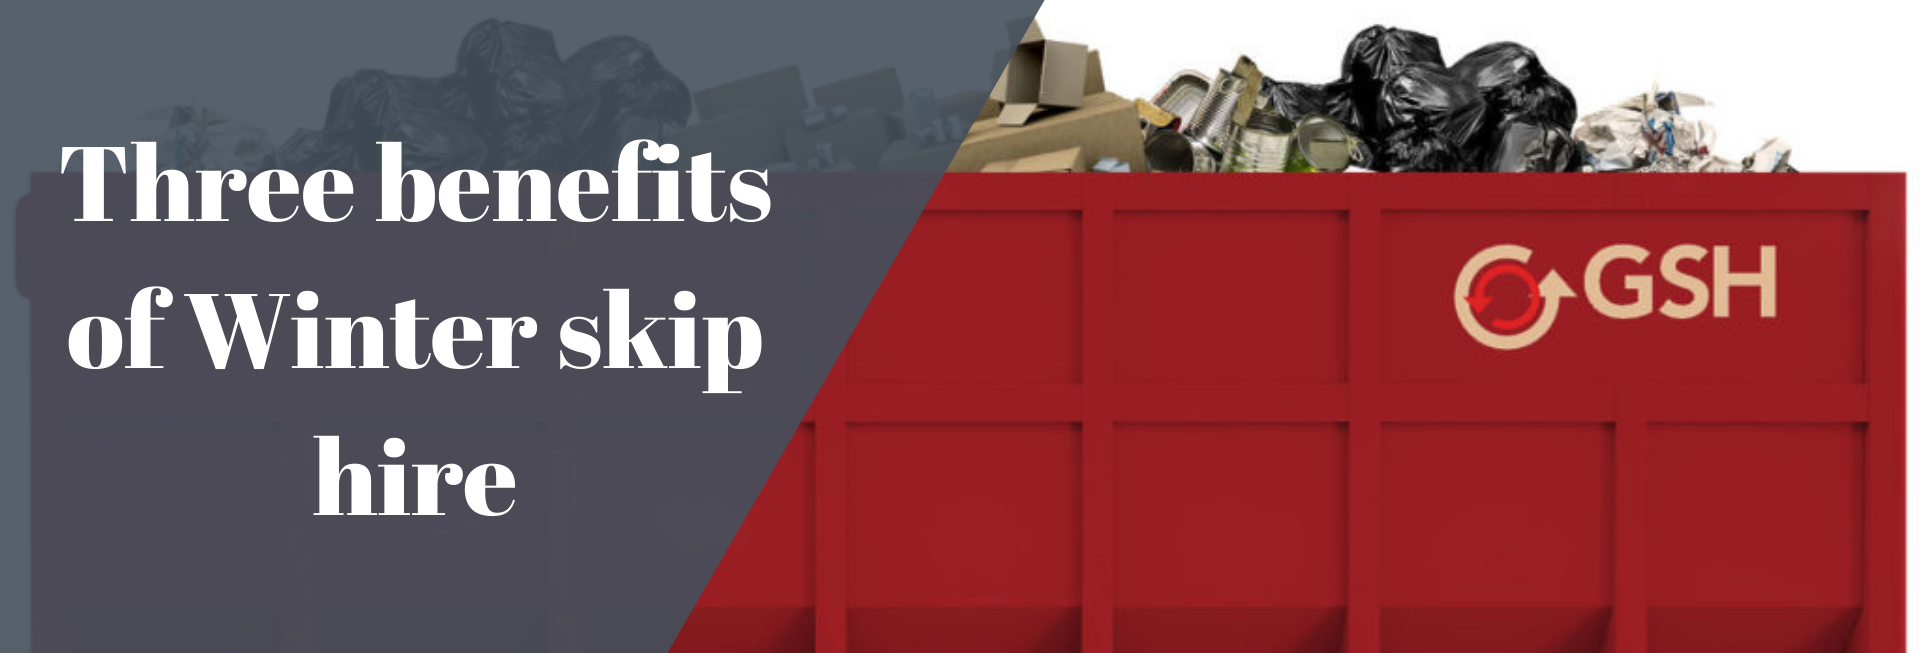 Three benefits of Winter skip hire